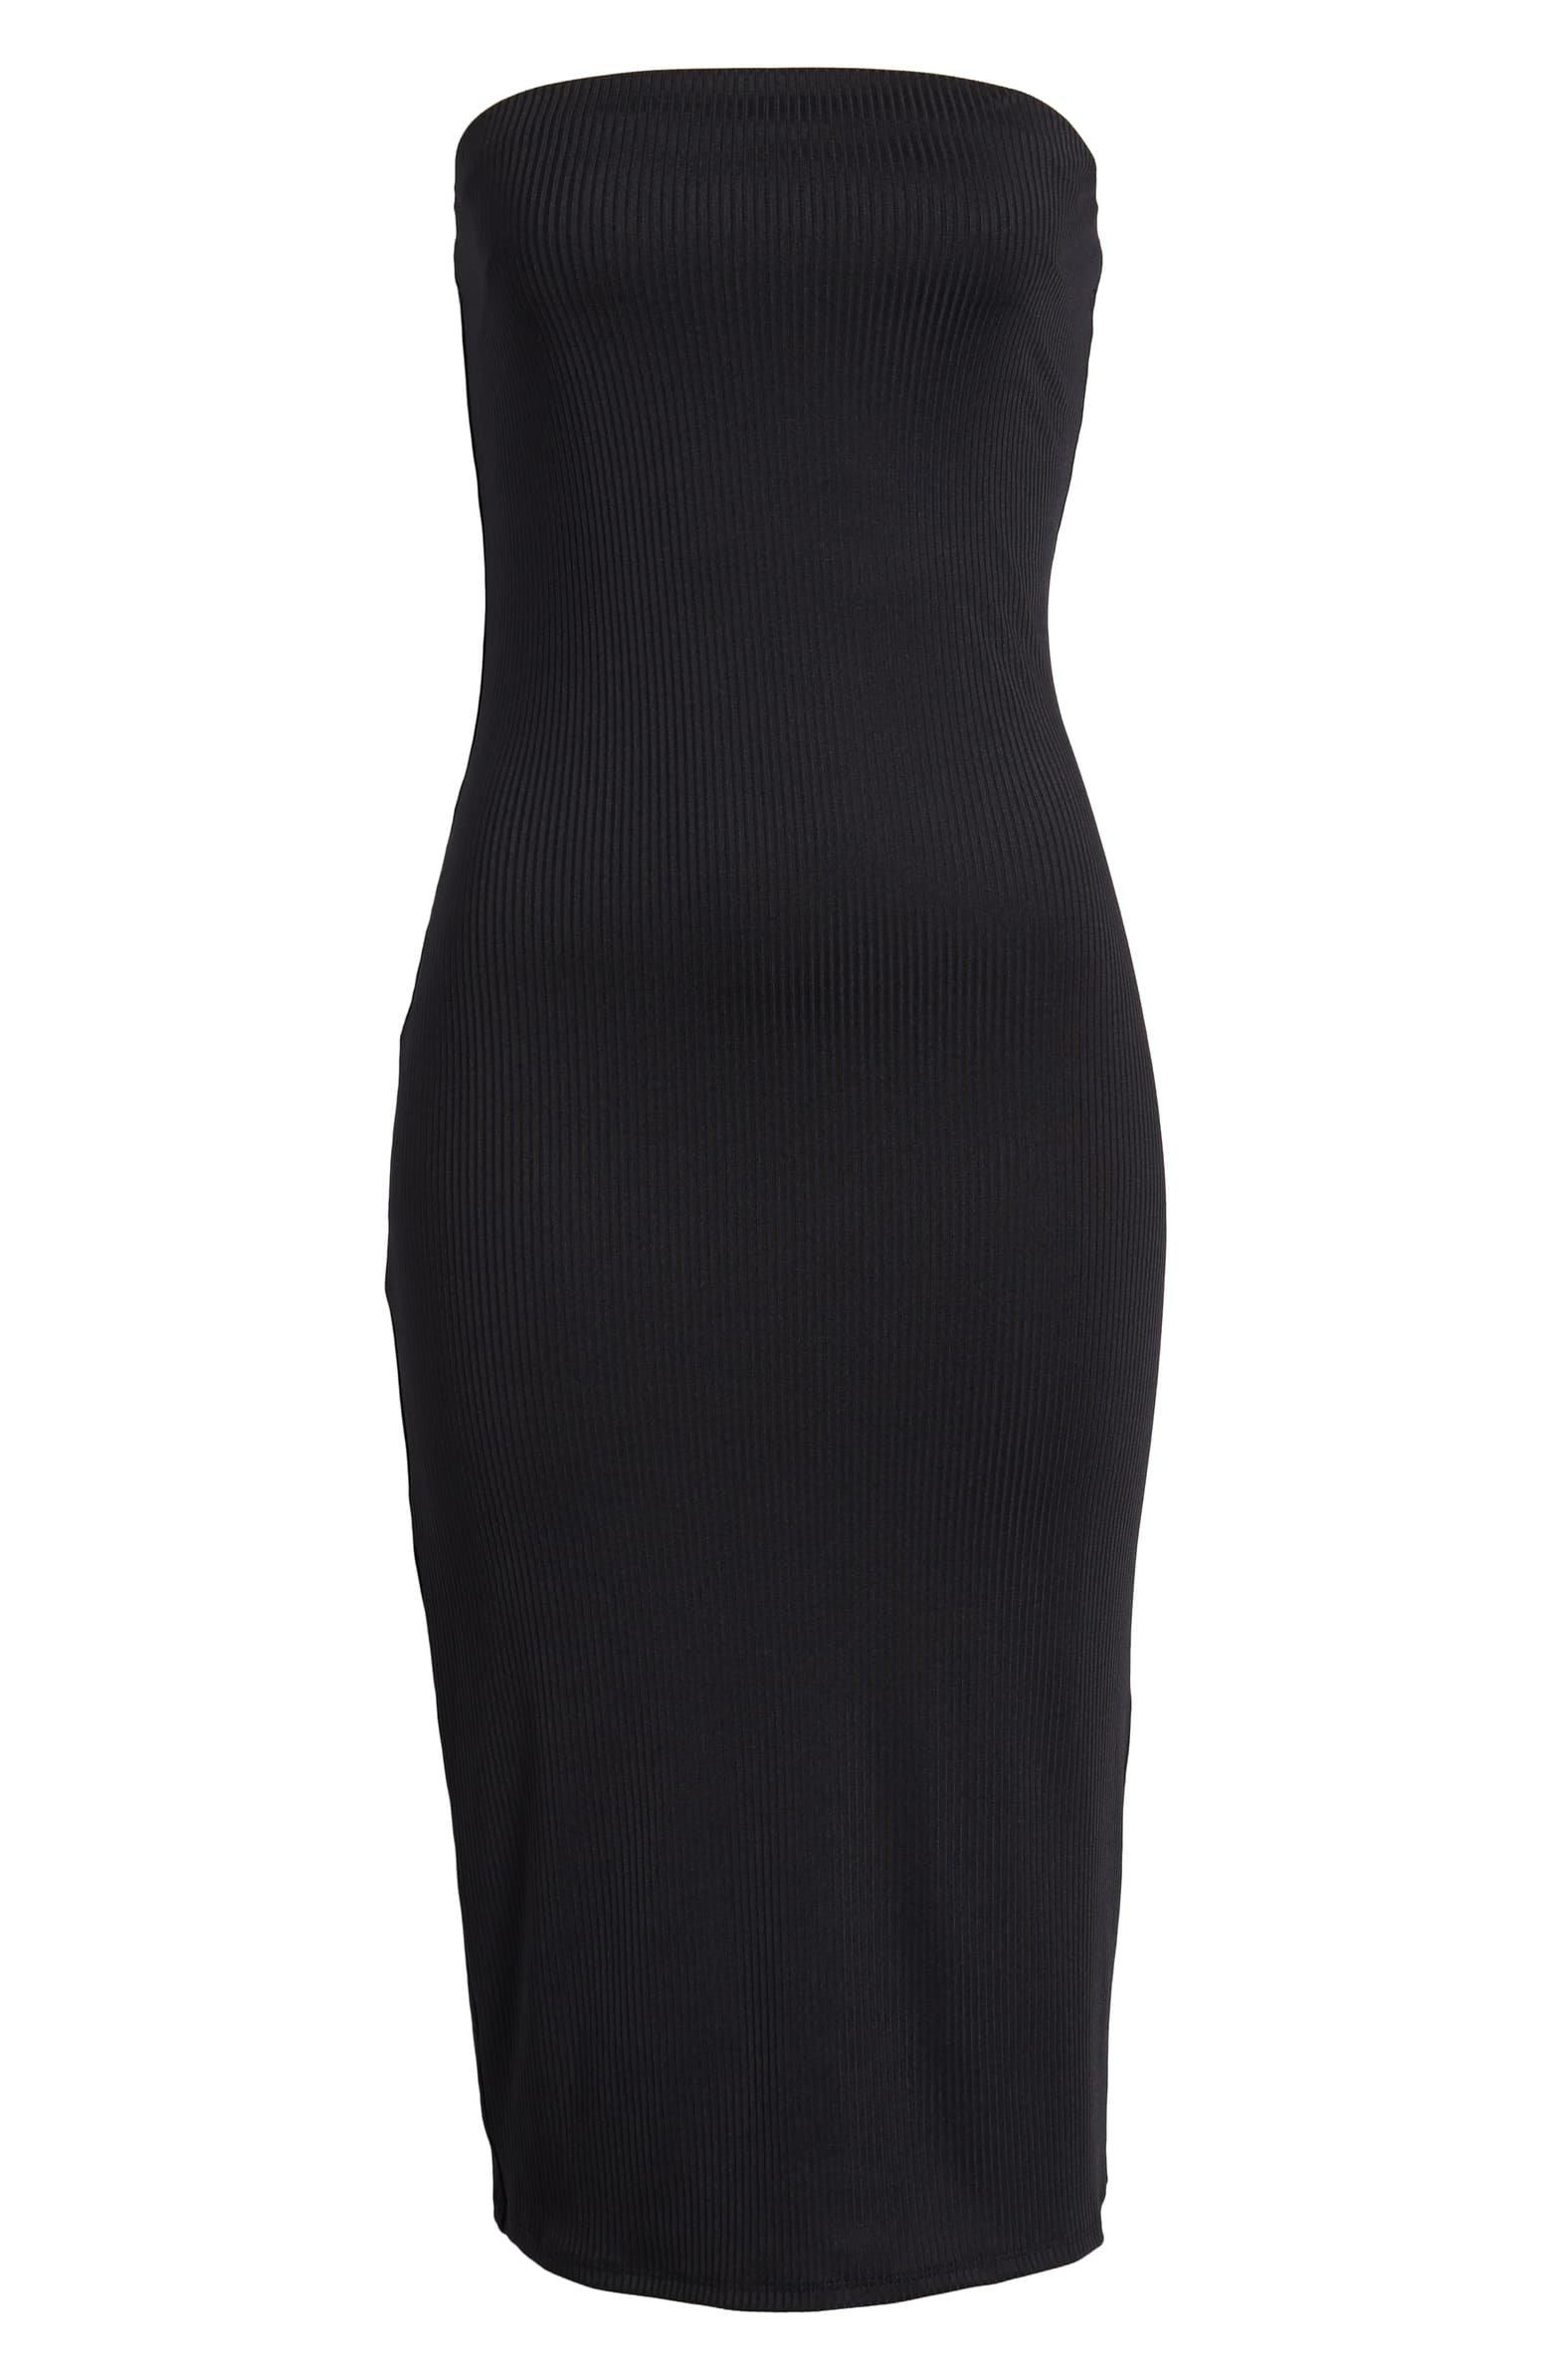 Leith Ribbed Midi Strapless Tube Dress Black